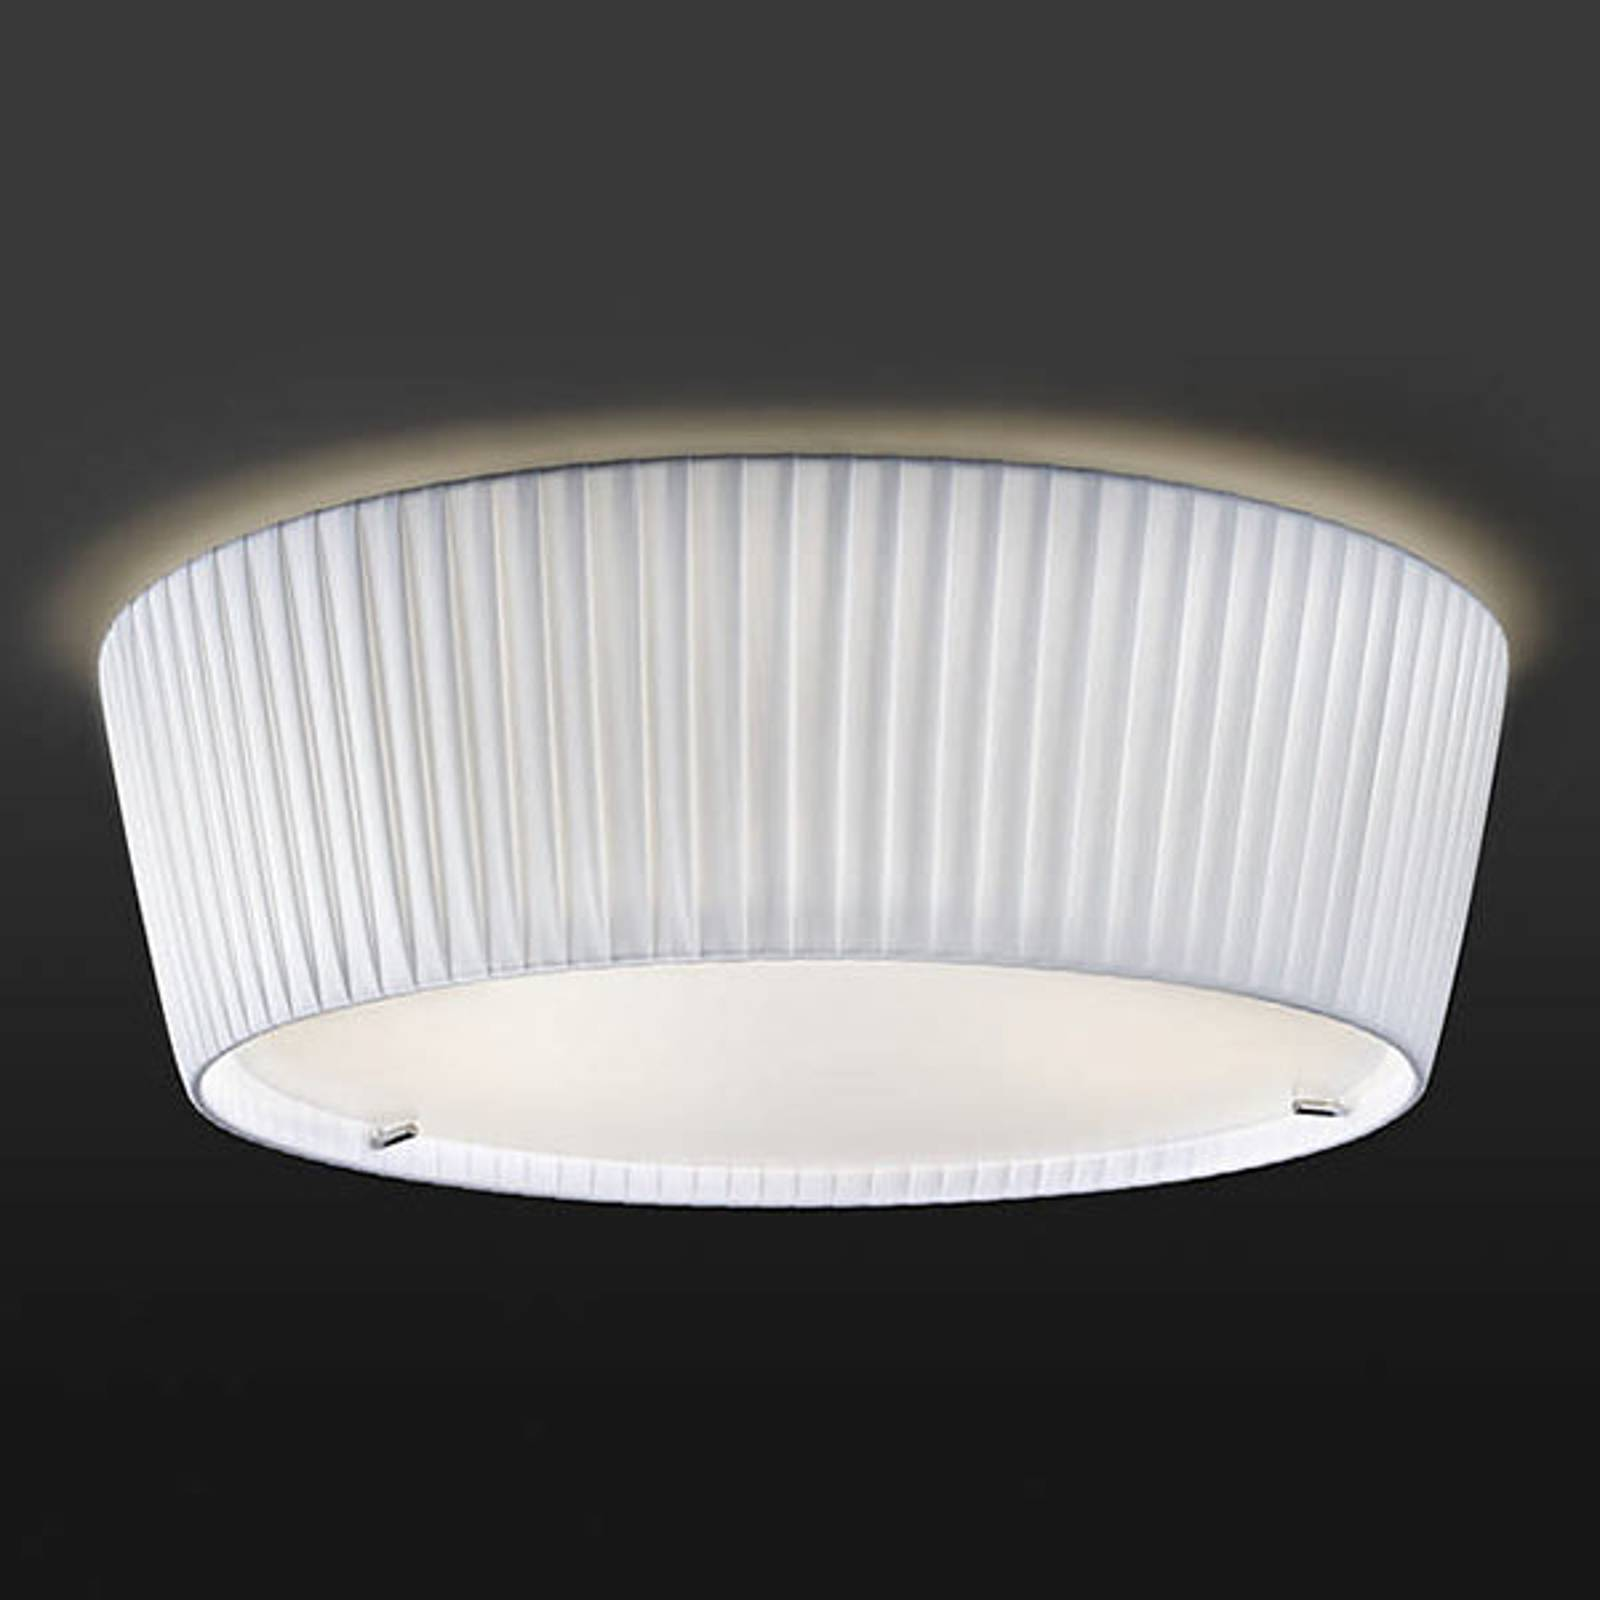 Bover Plafonet 43 - stoffen plafondlamp, Band wit